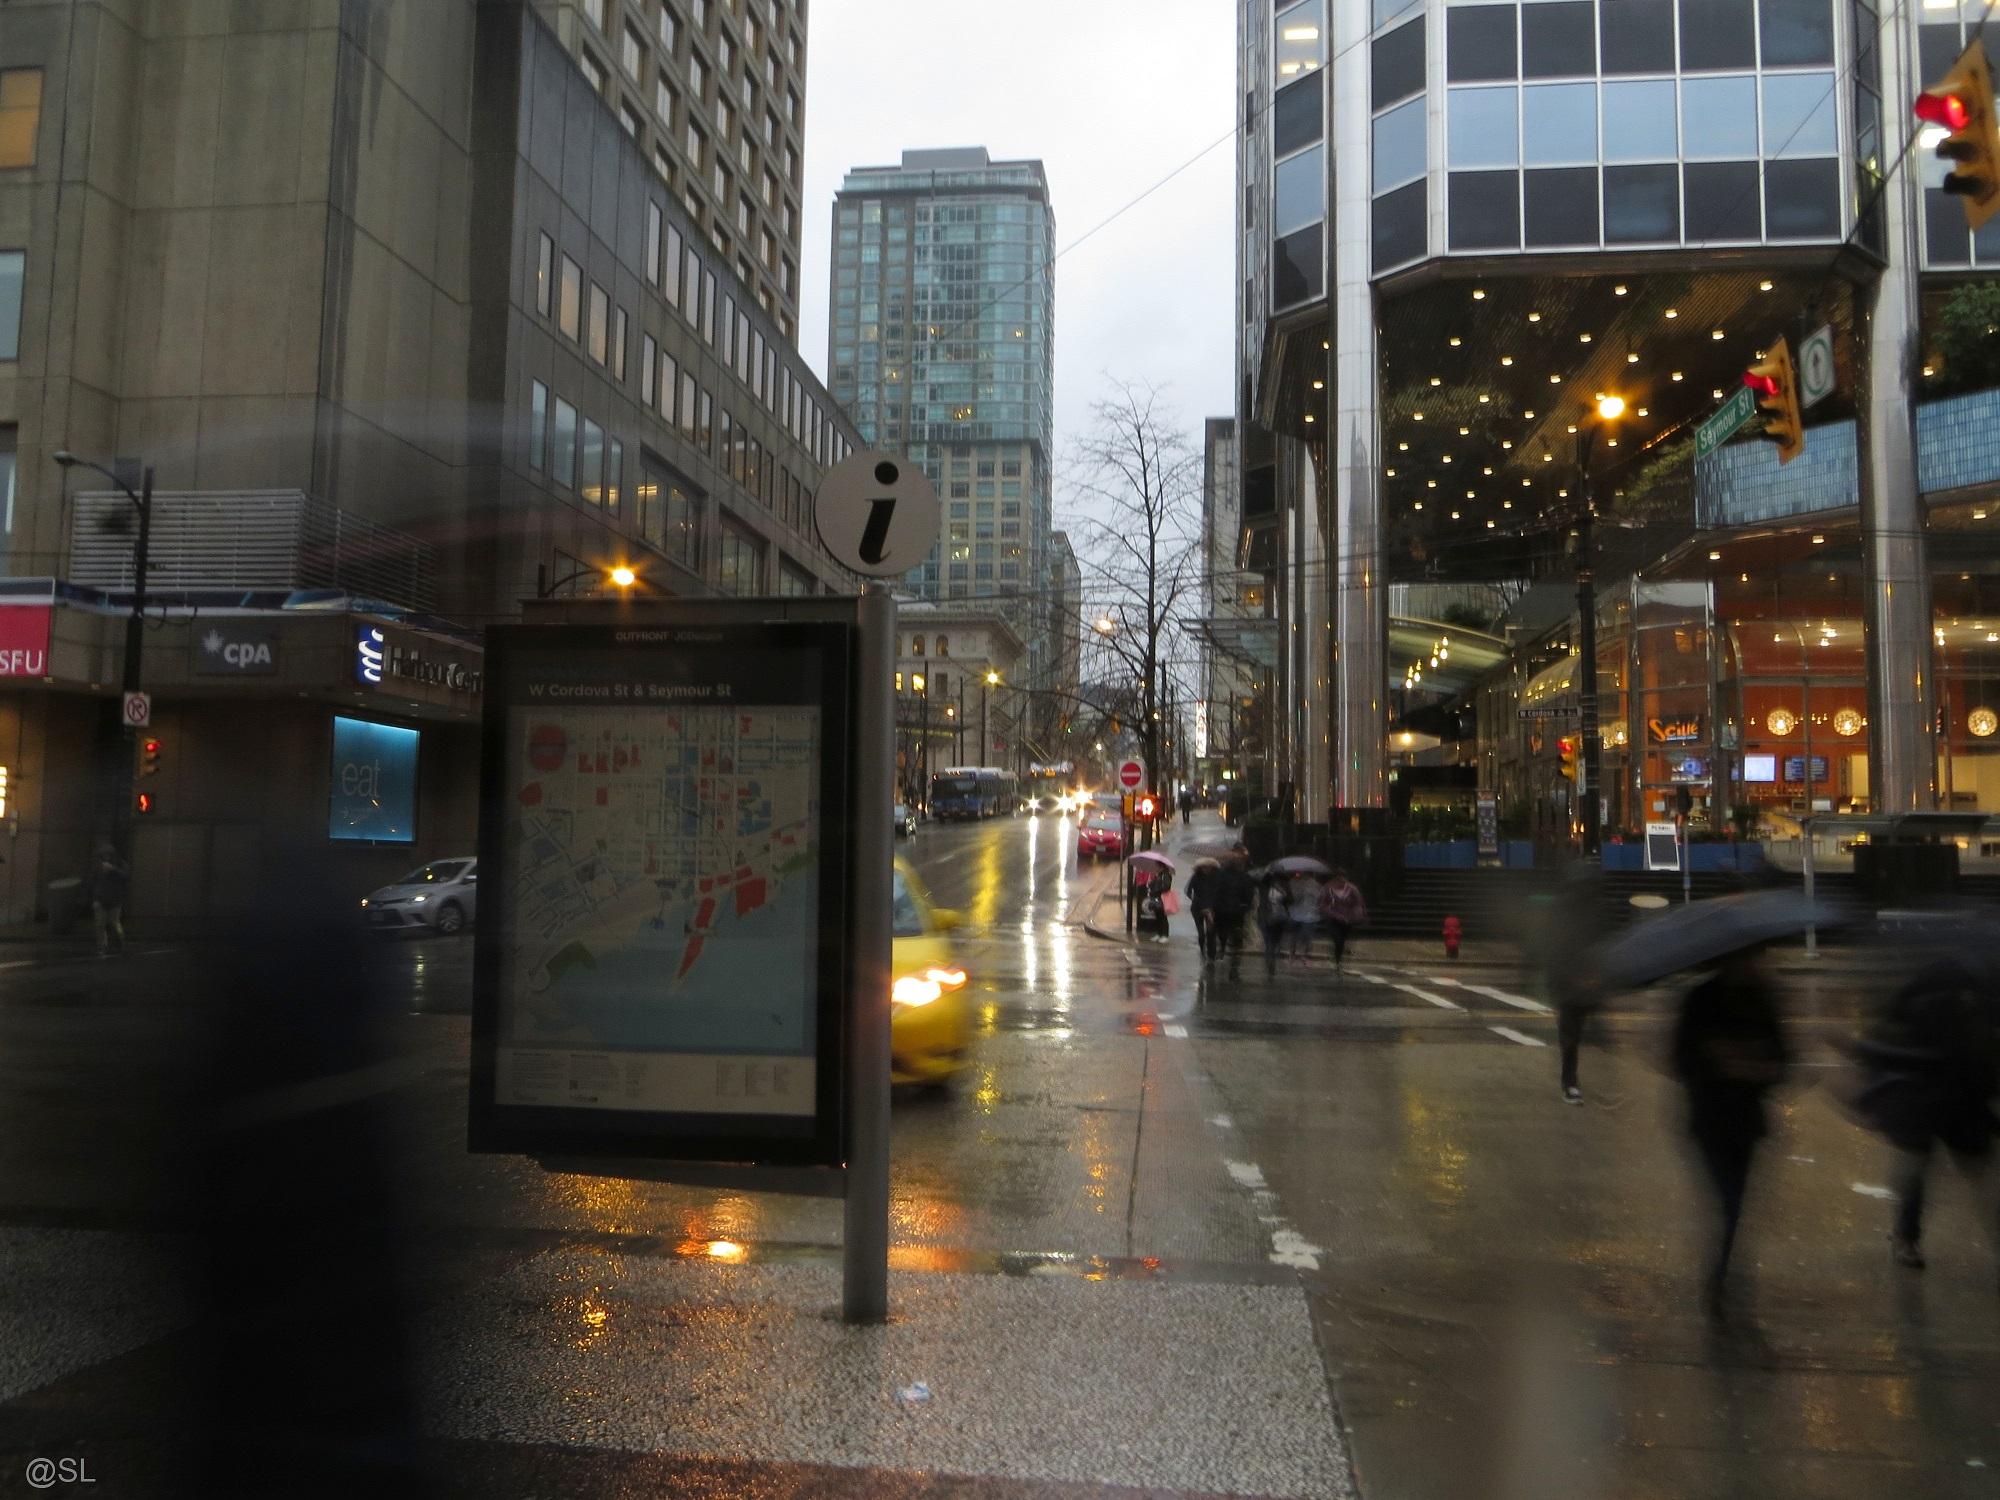 Street in the rain